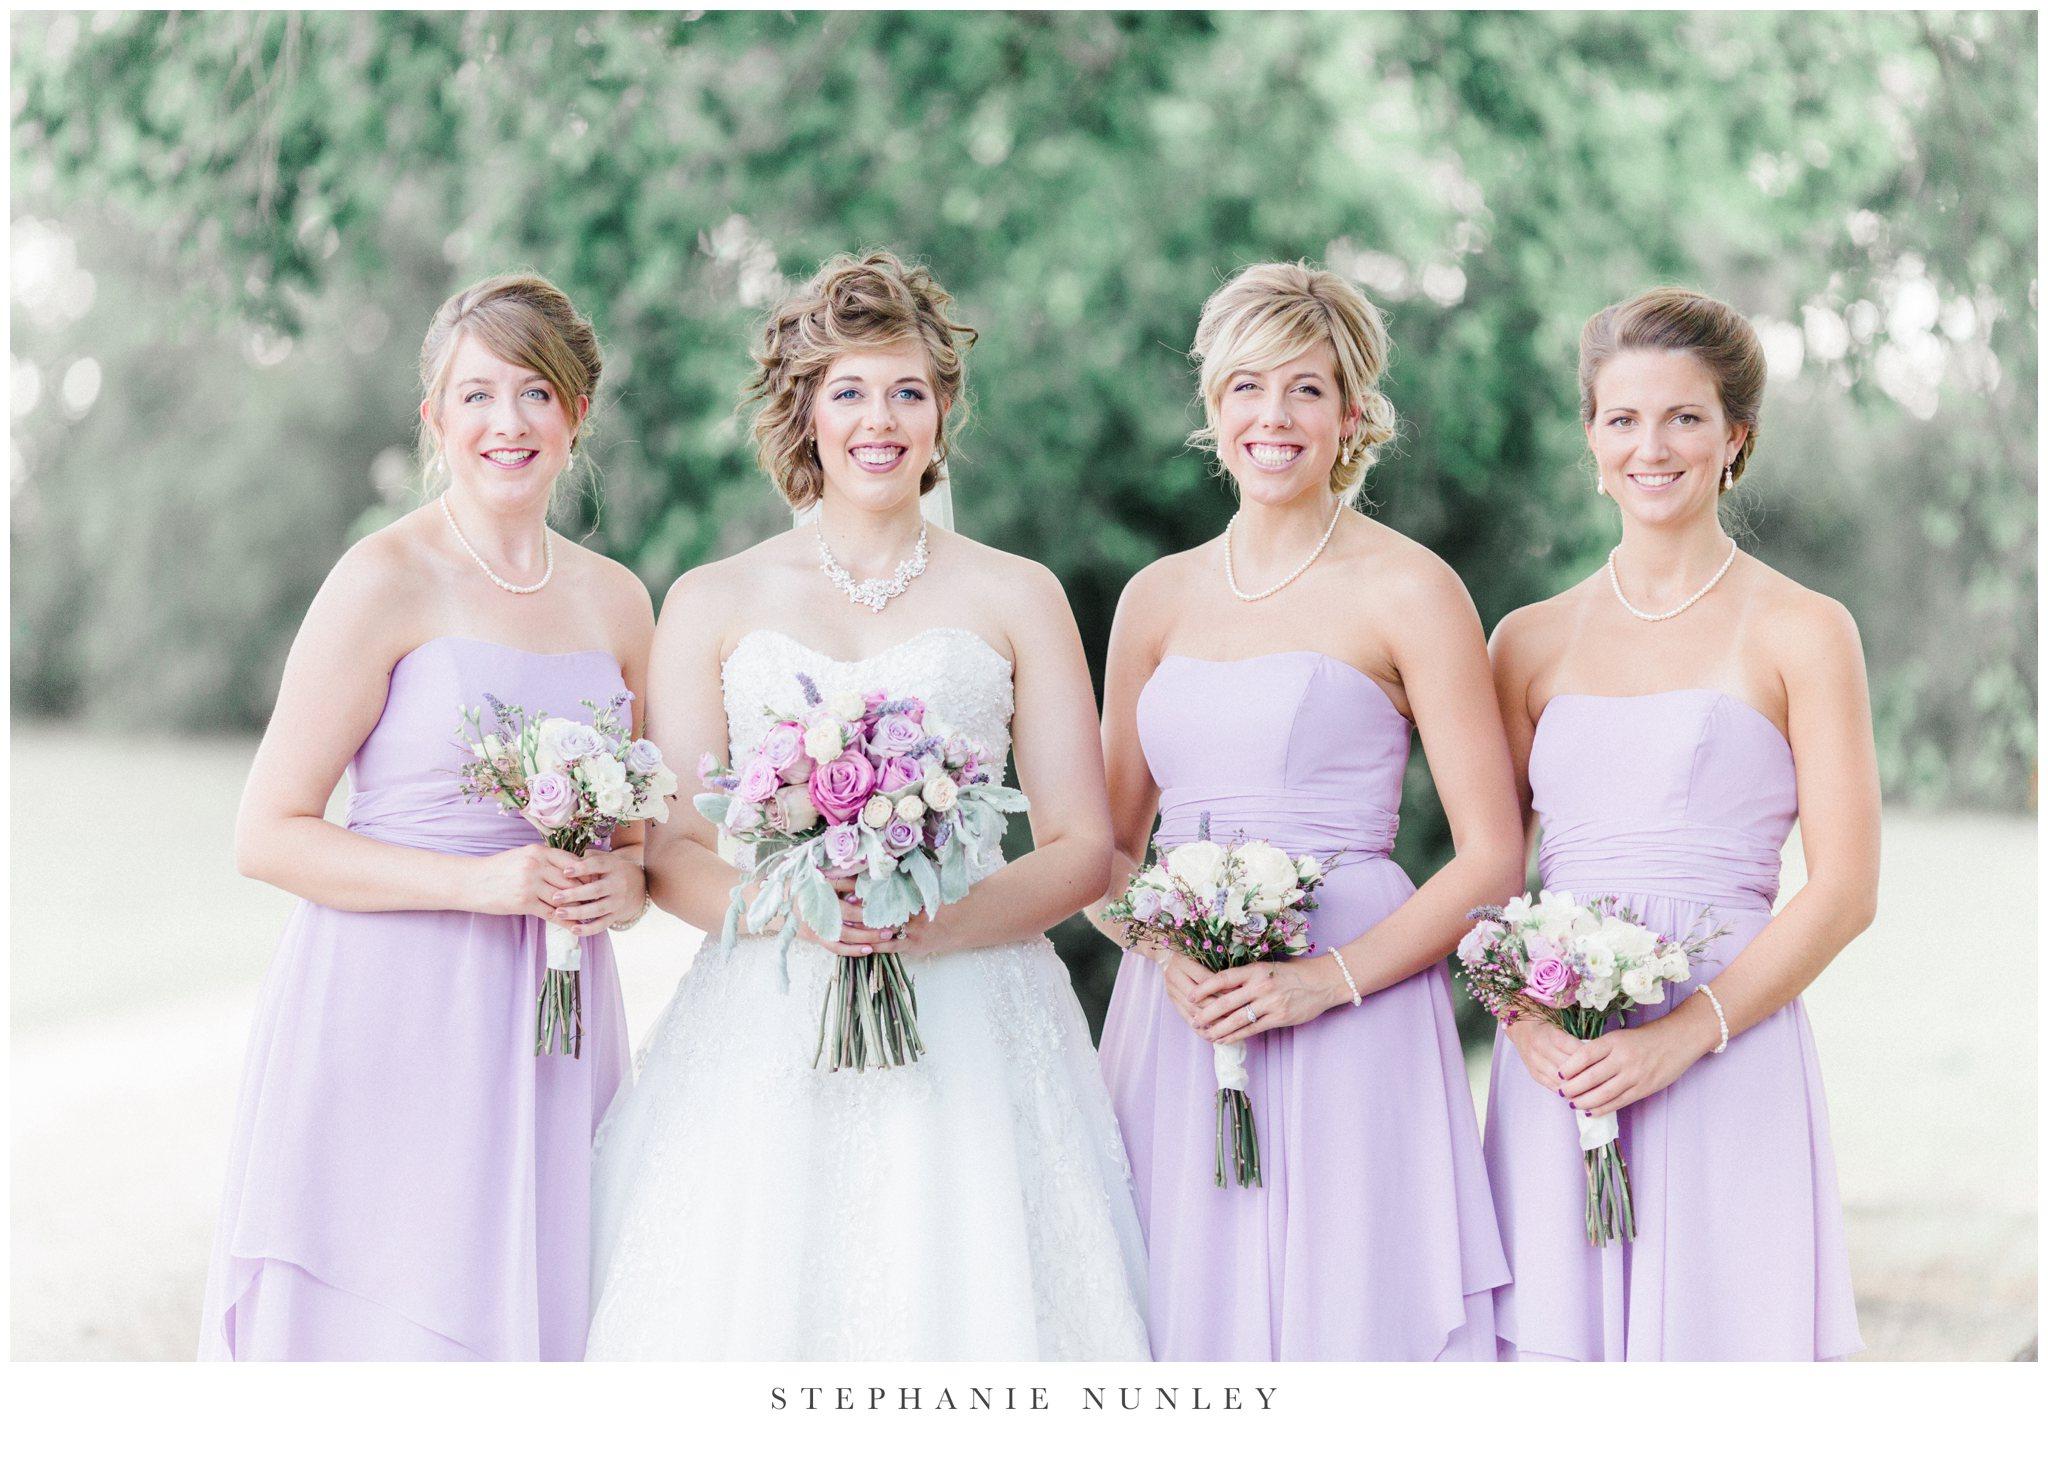 southern-classy-outdoor-barn-wedding-photos-0059.jpg